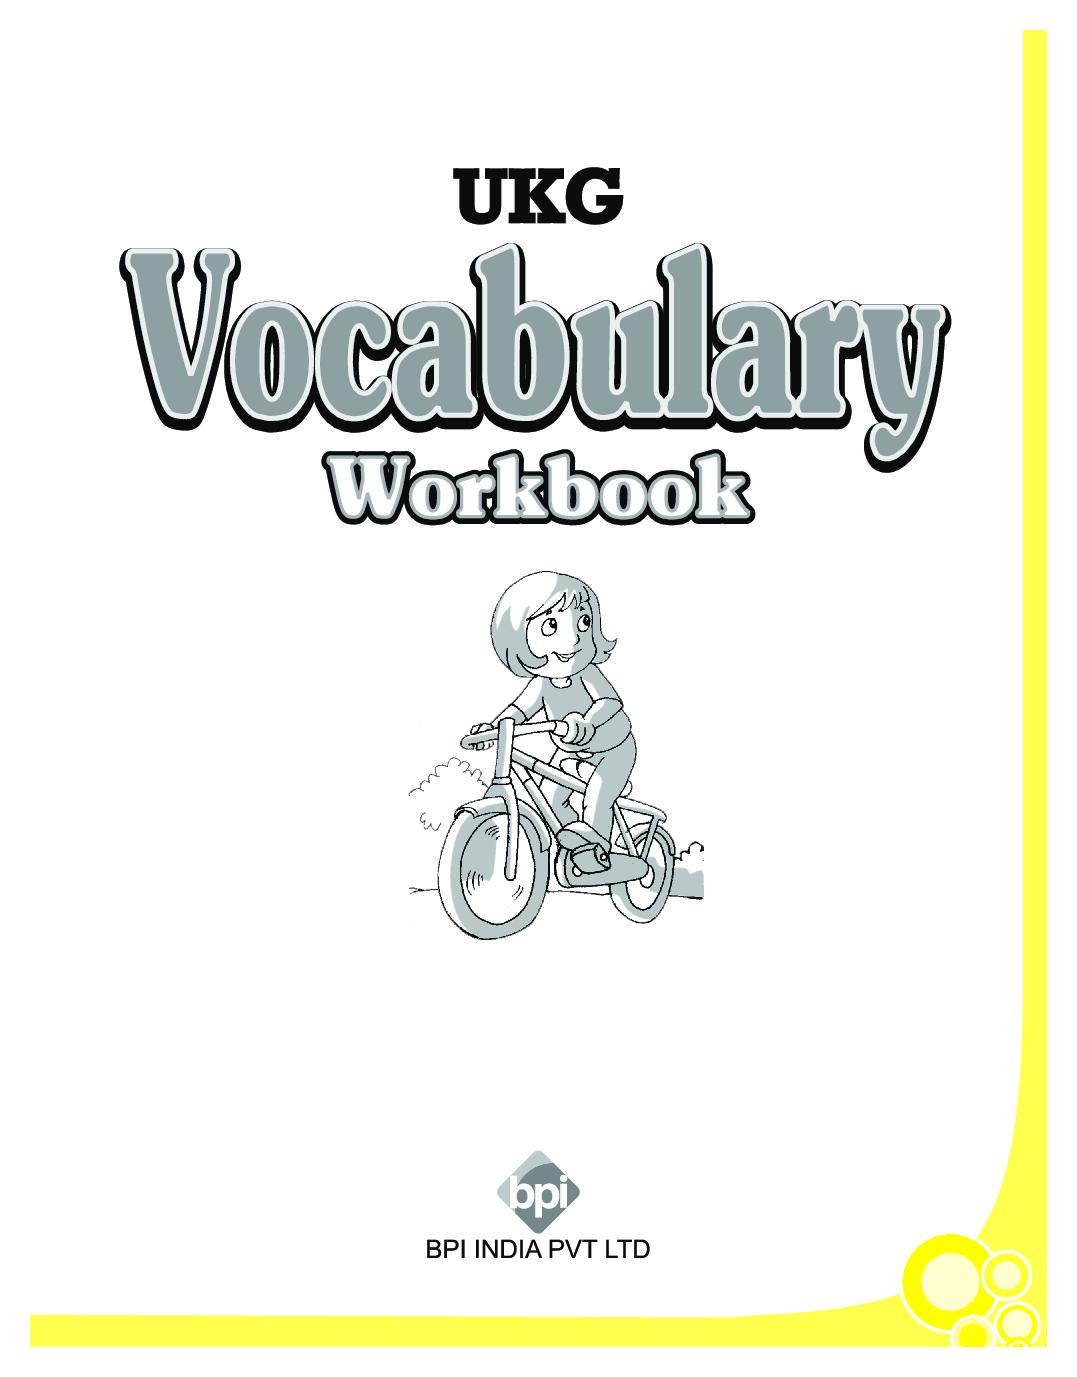 Download Ukg Vocabulary Workbook By Bpi Online